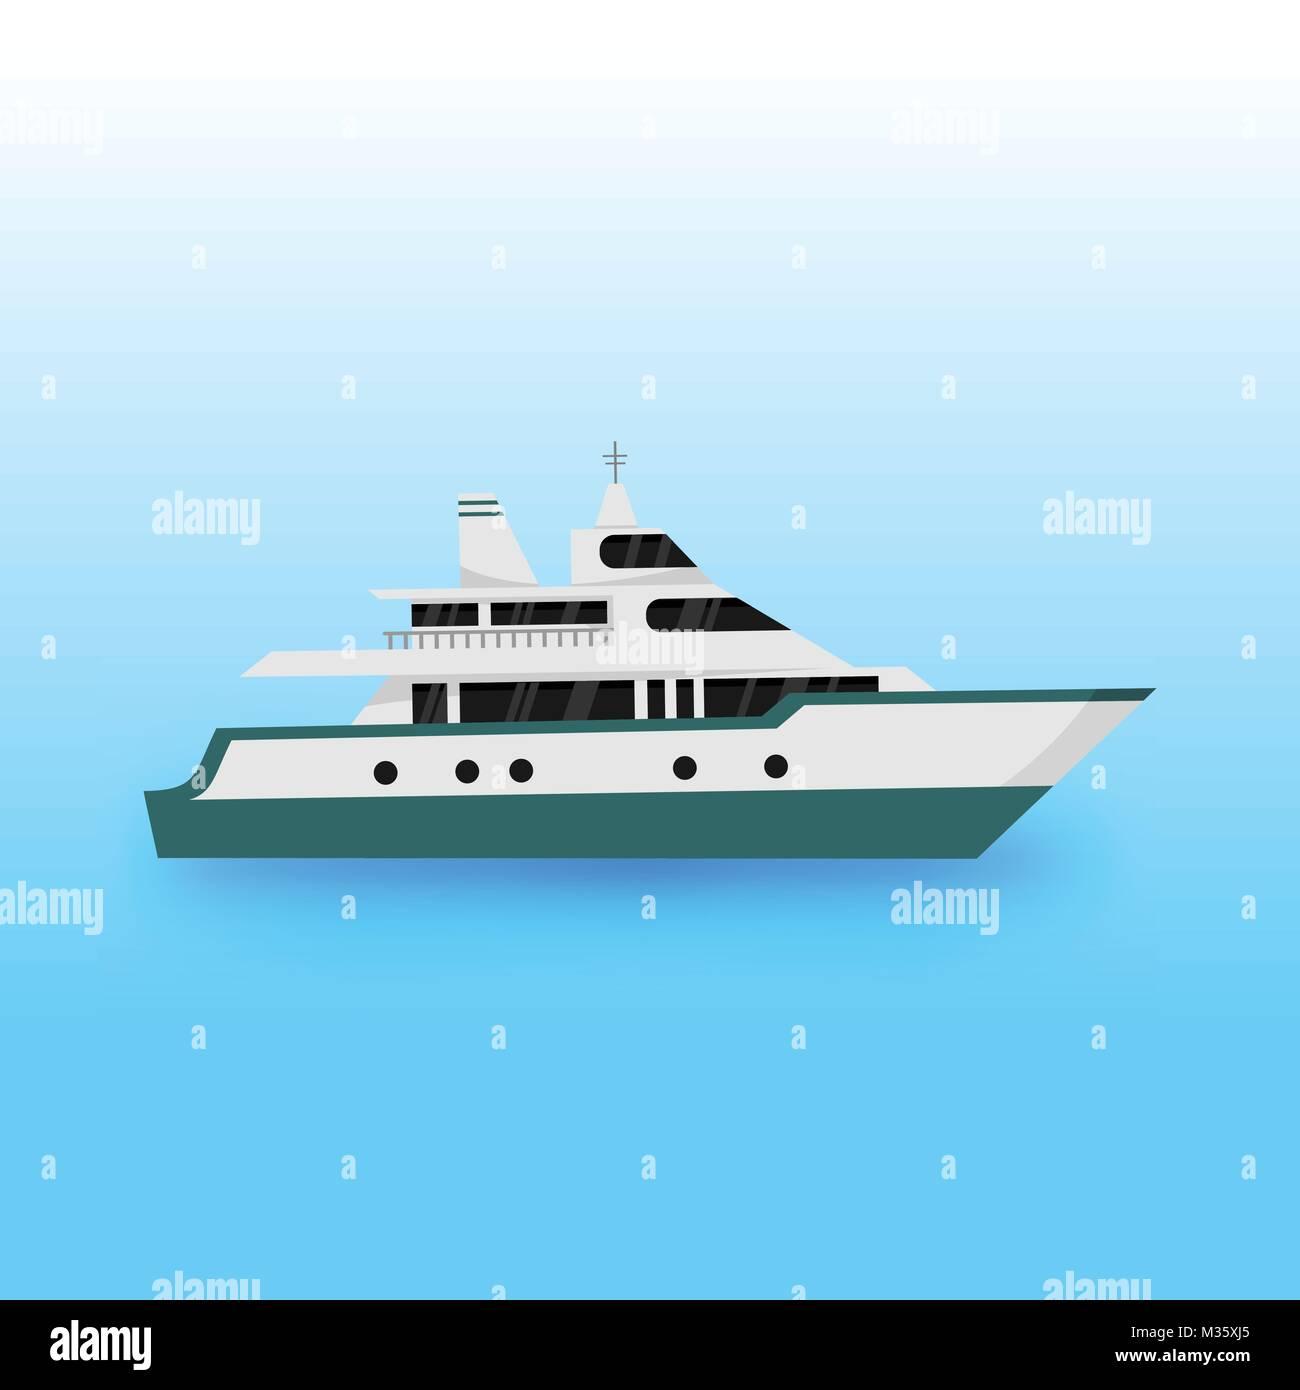 Luxury Yacht Transportation Vector Illustration Graphic Design - Stock Image